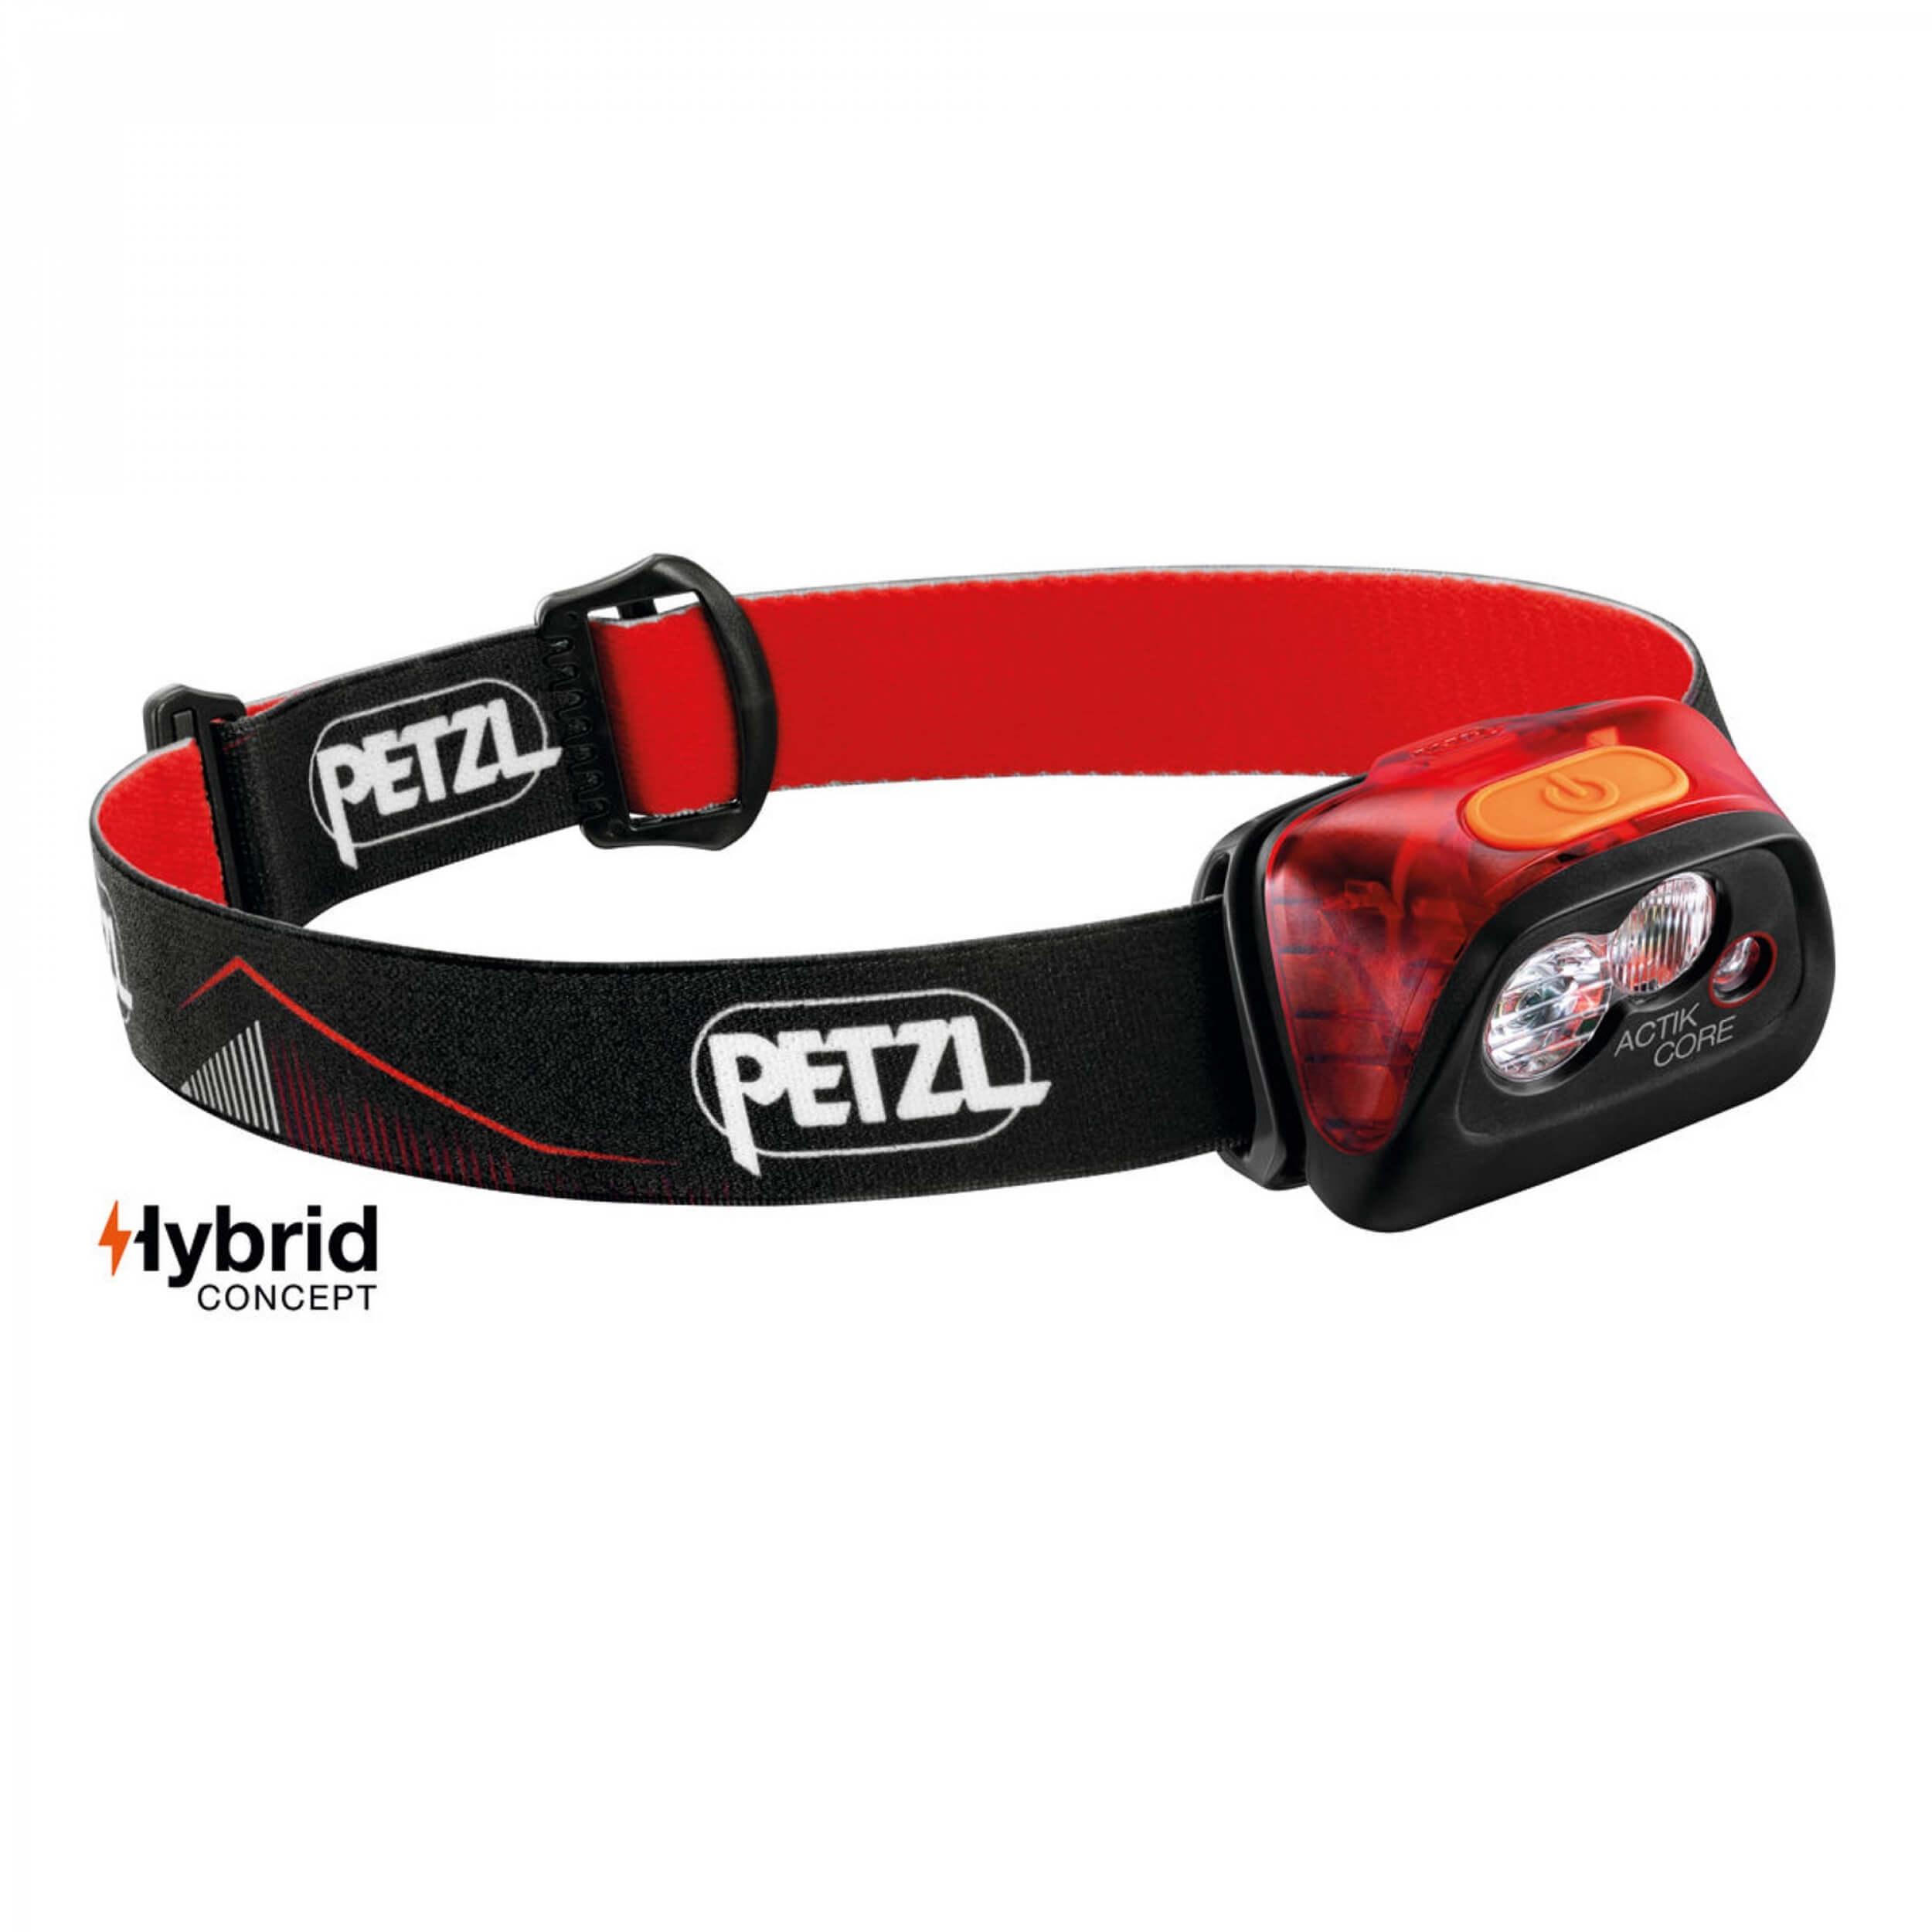 Petzl ACTIK CORE 450 Lumen schwarz/rot